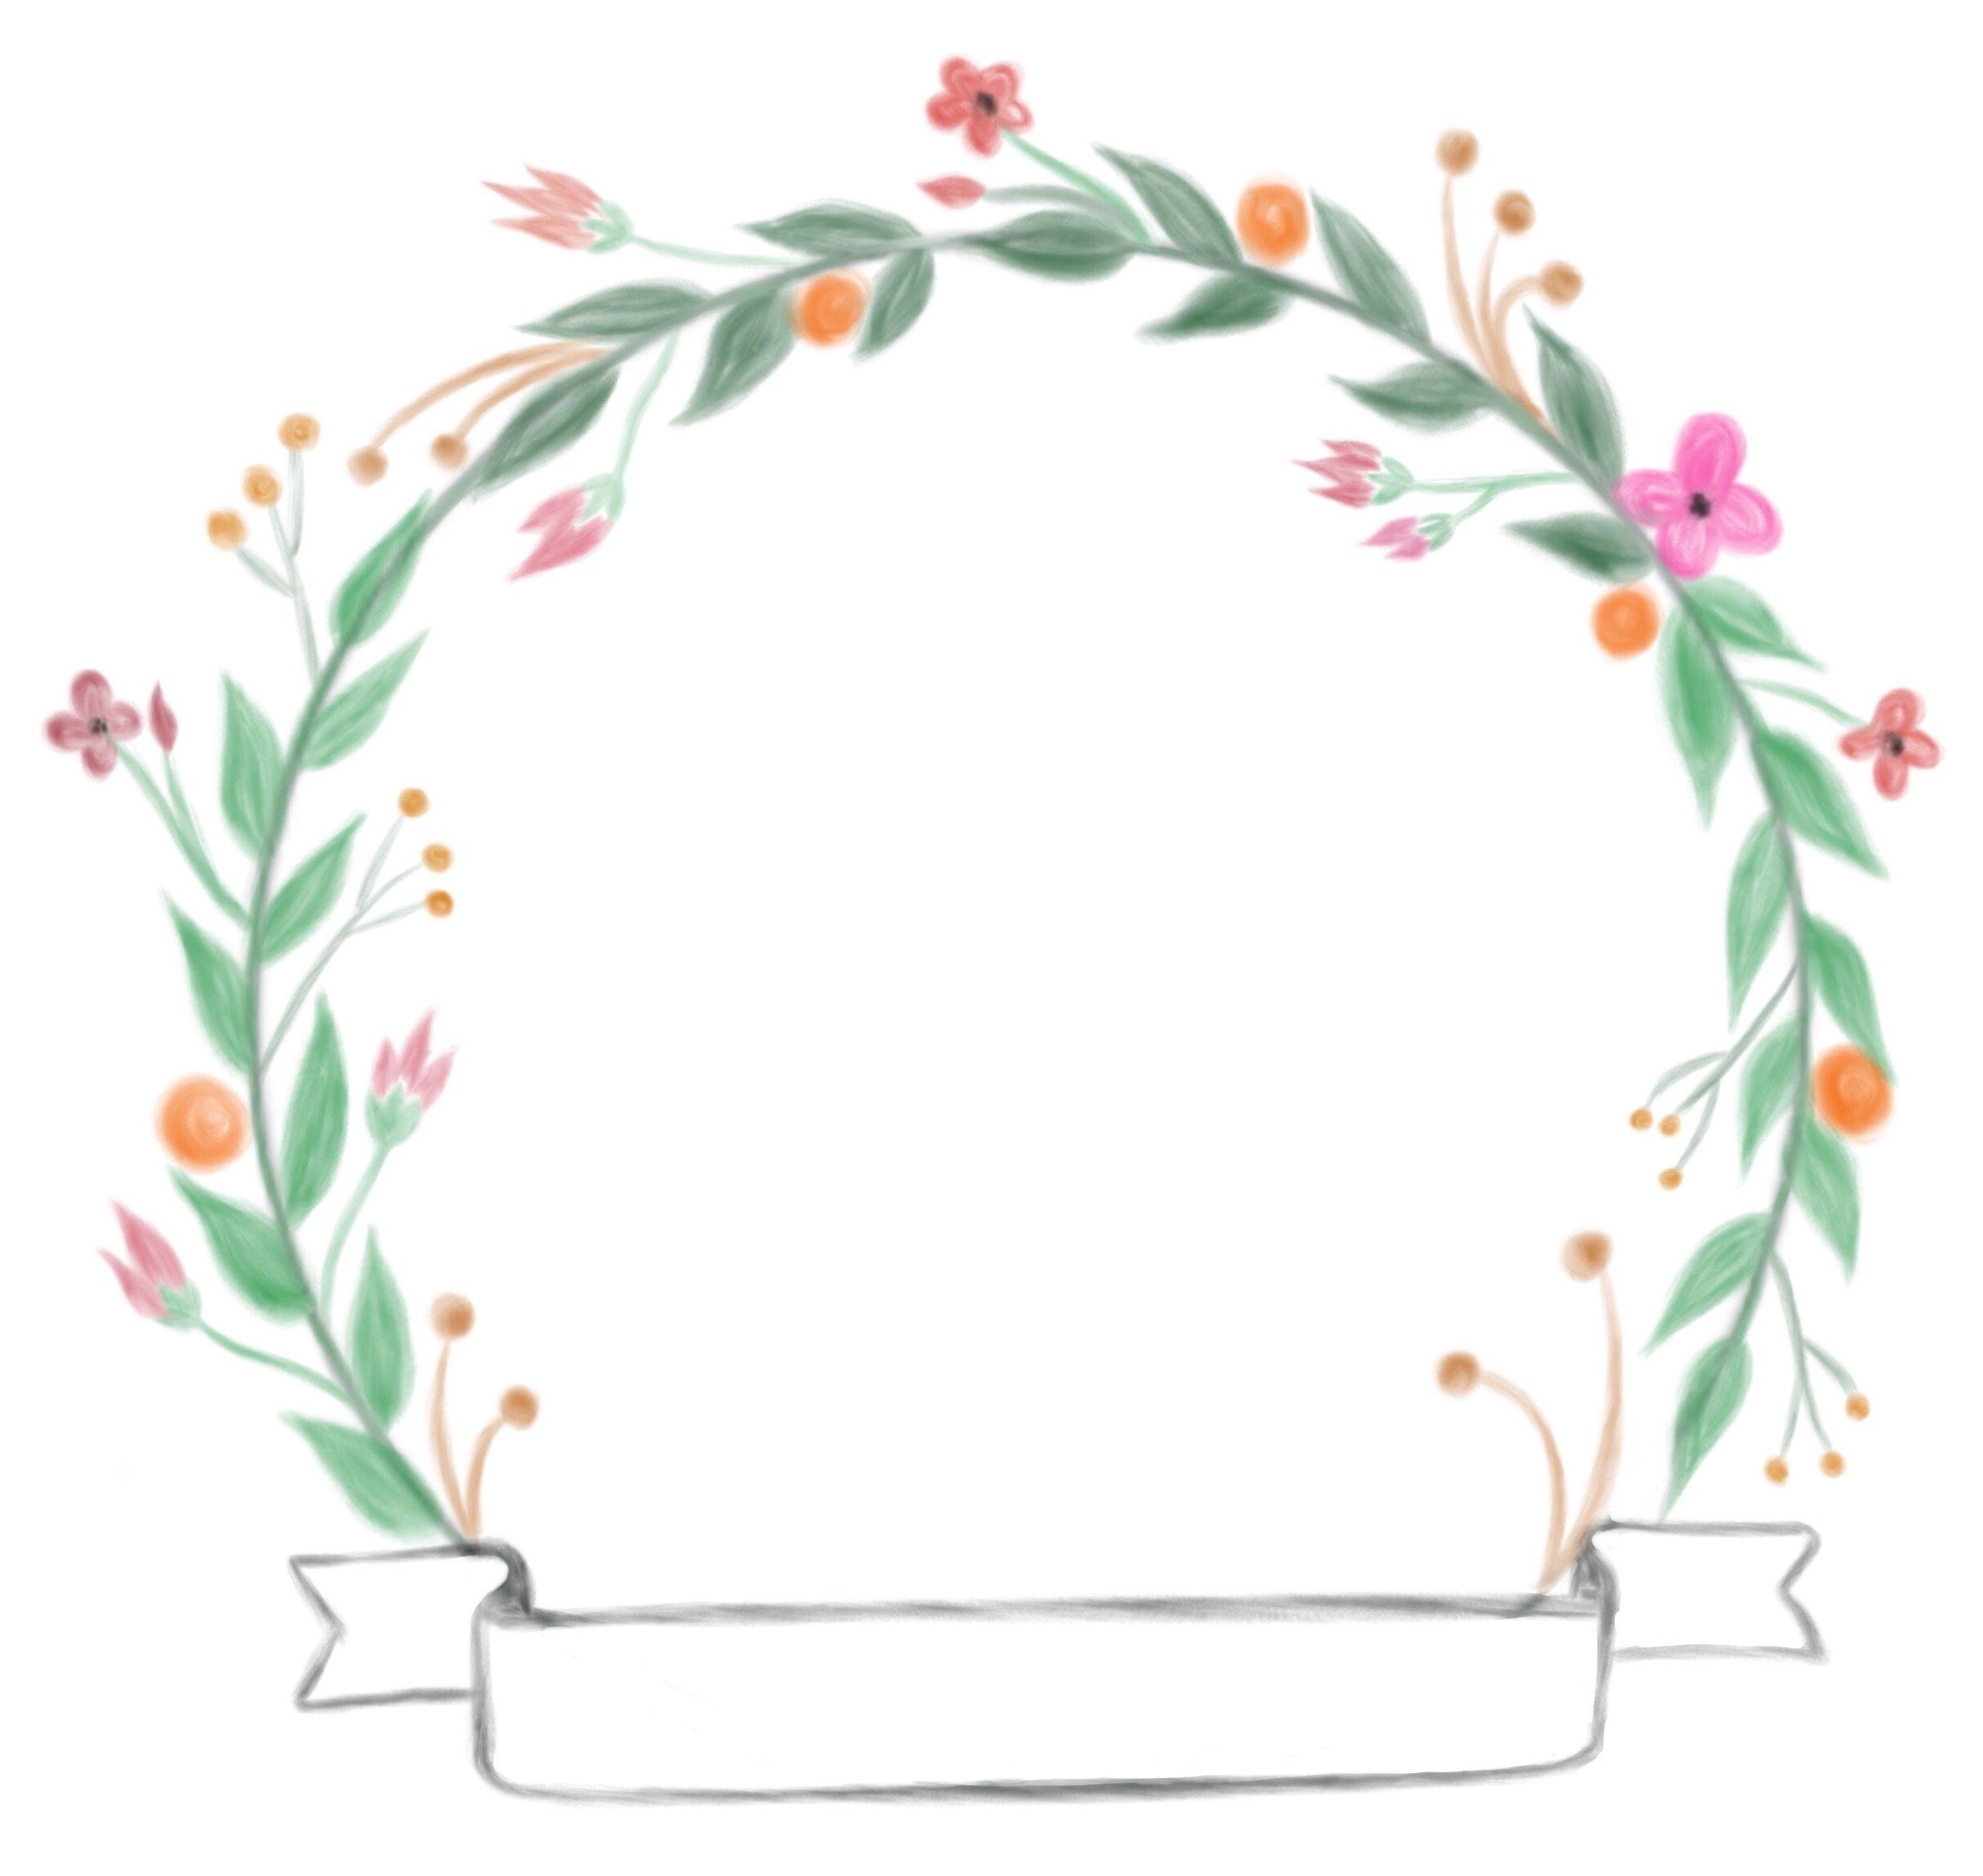 Free floral doodle watercolor aquarel wreath, flower wreath.